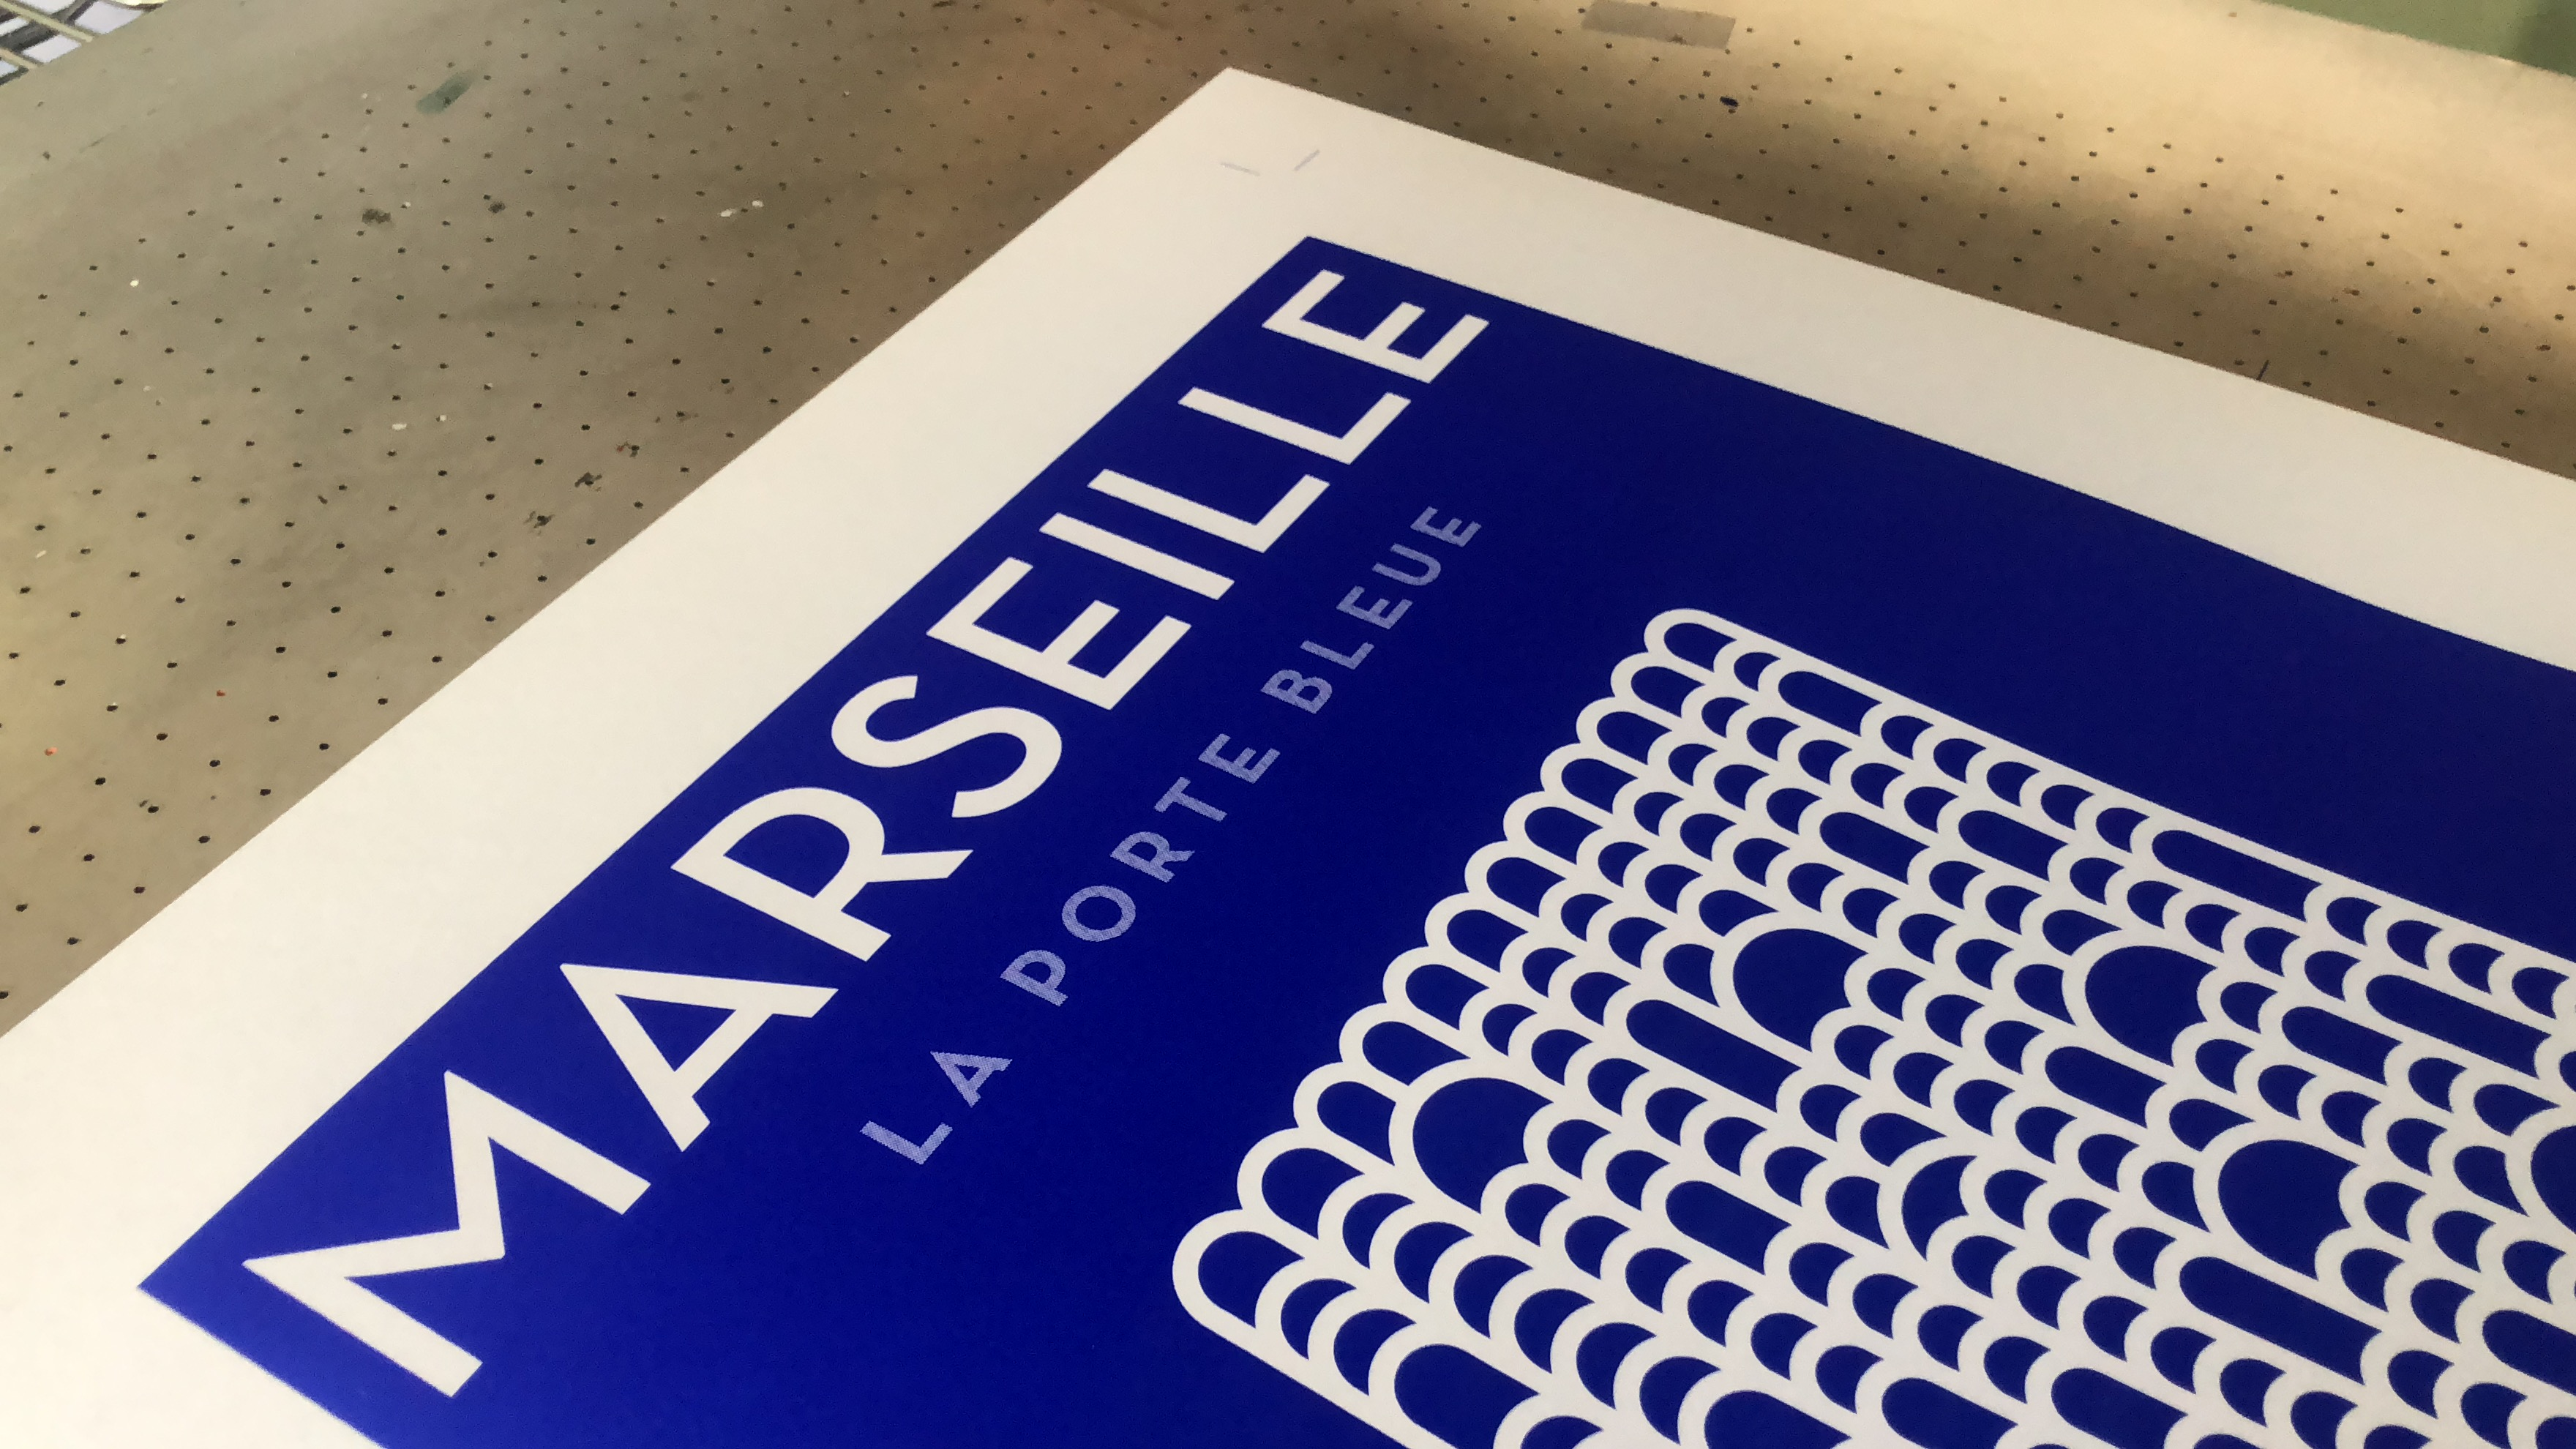 la-porte-bleue-marseille-impression-poster-serigraphie-pietriarchitectes